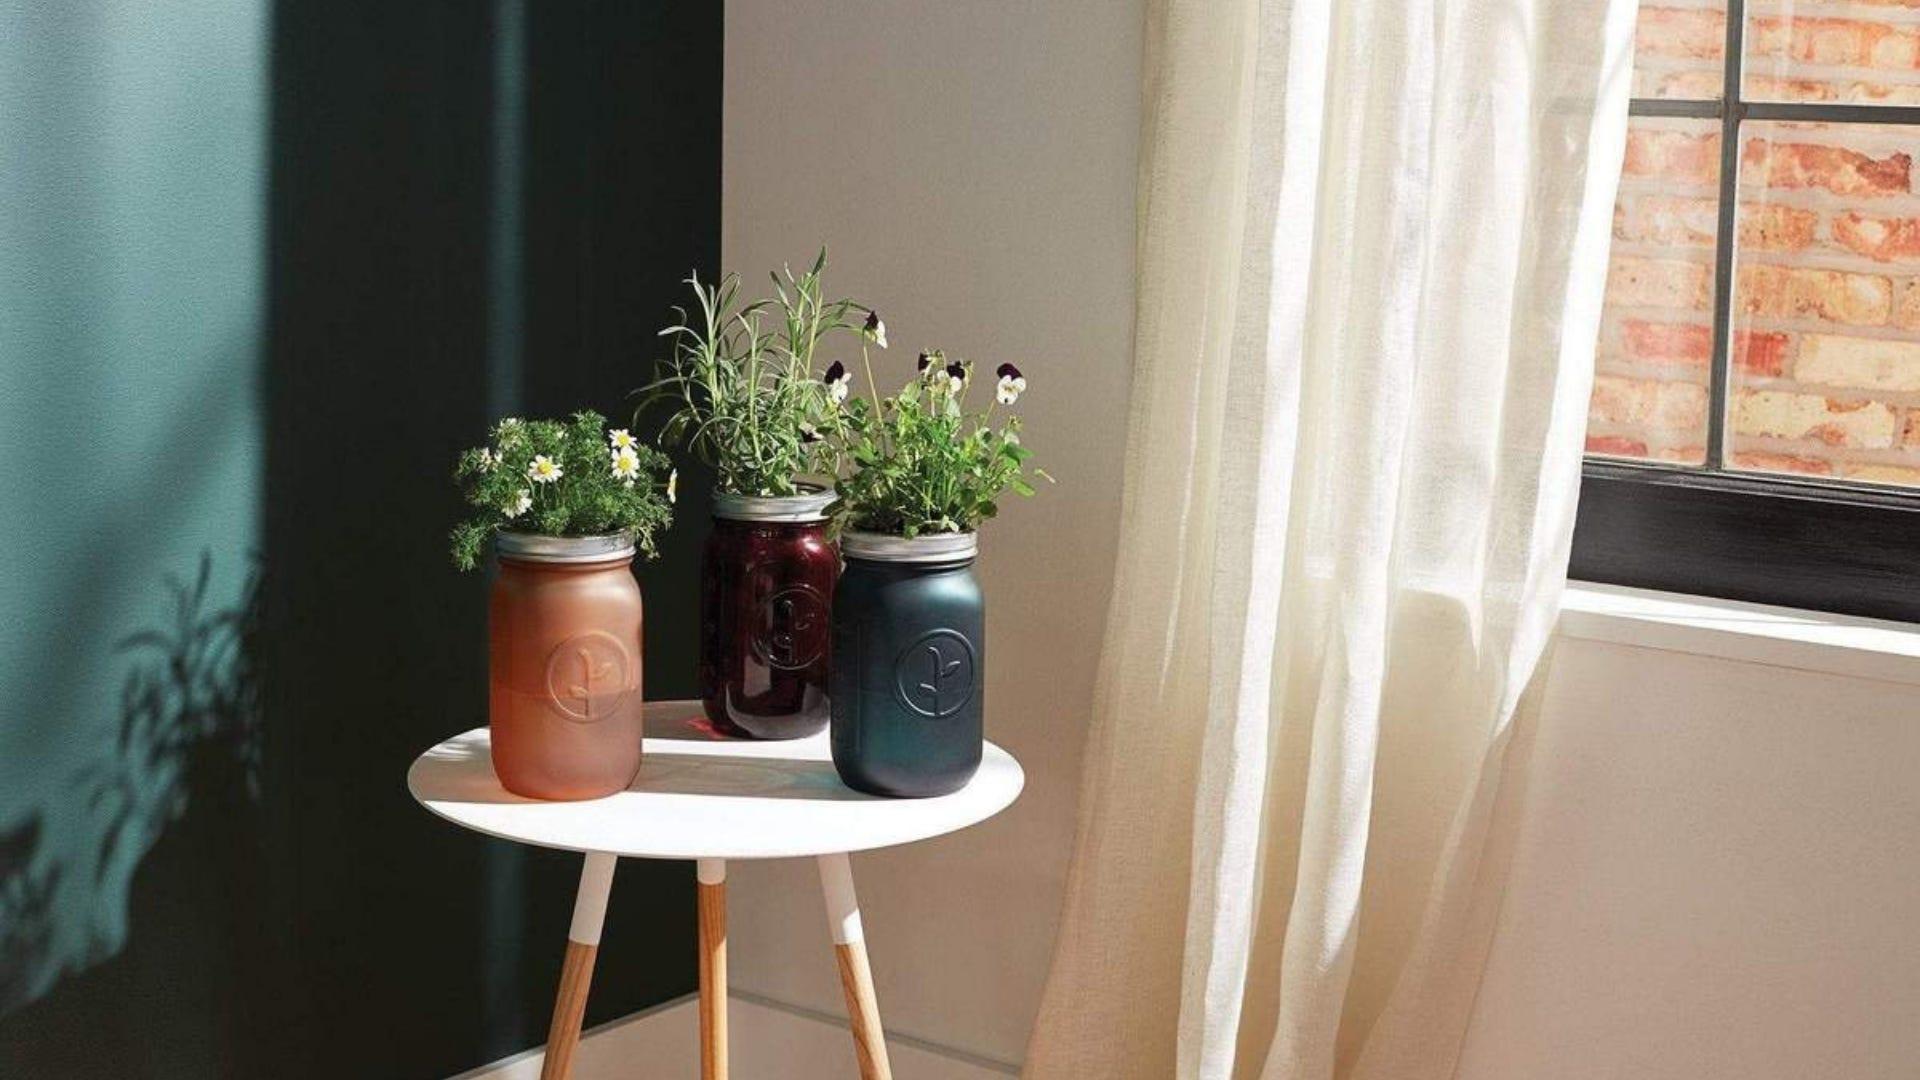 Three jars growing plants near windowsill